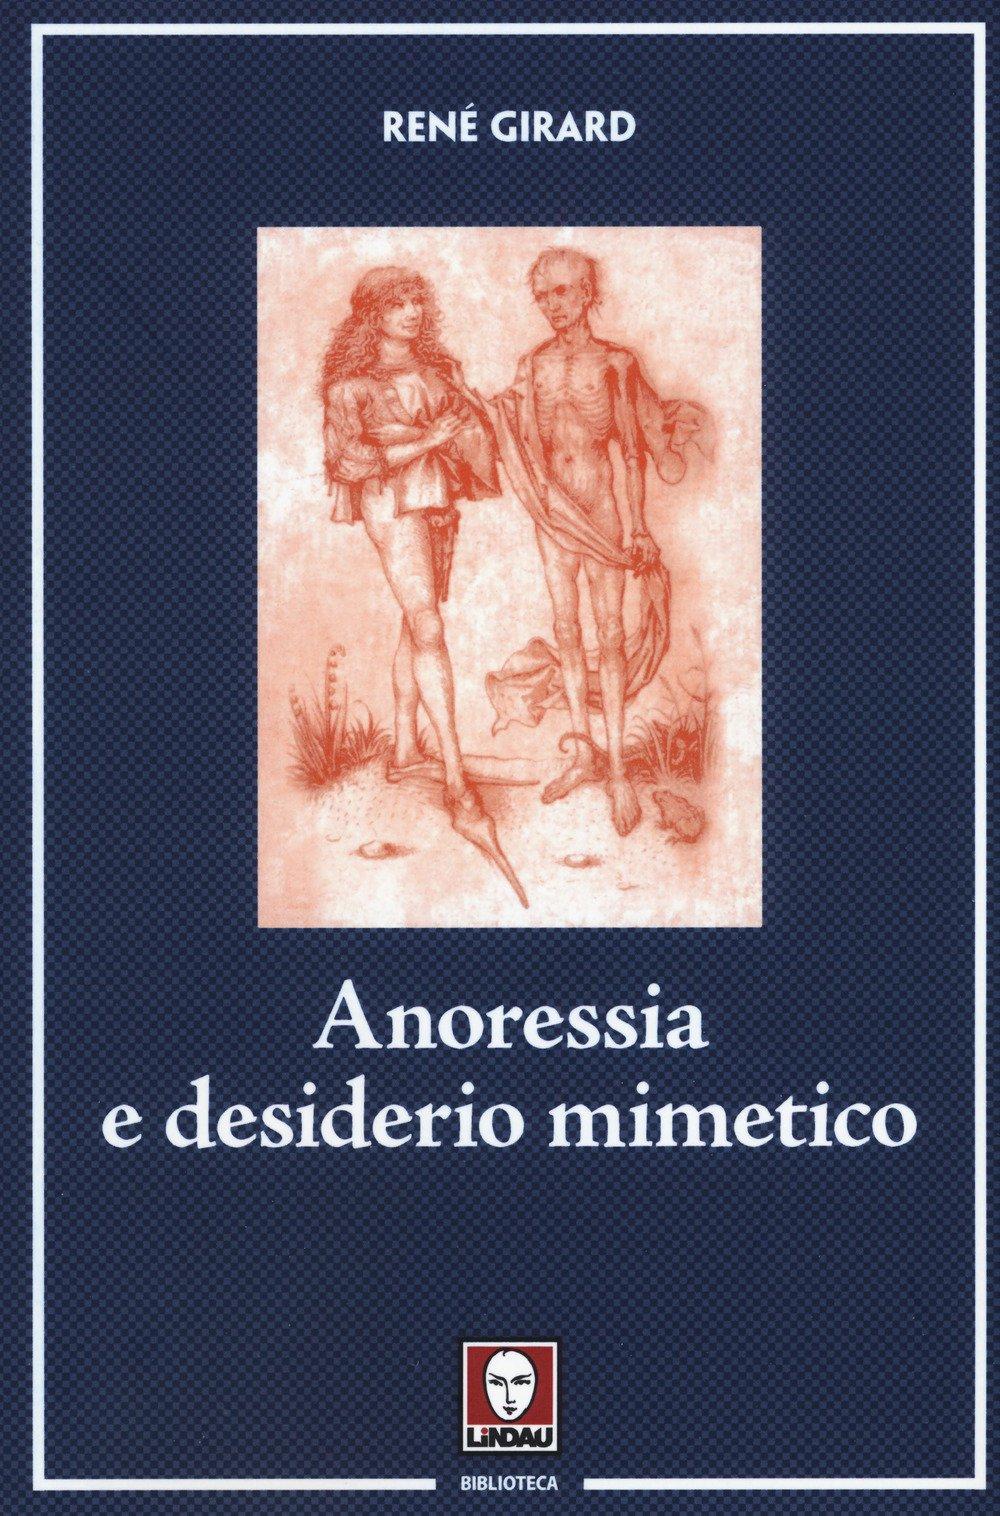 Anoressia e desiderio mimetico Copertina flessibile – 12 ott 2017 René Girard C. Tarditi Lindau 8867087991